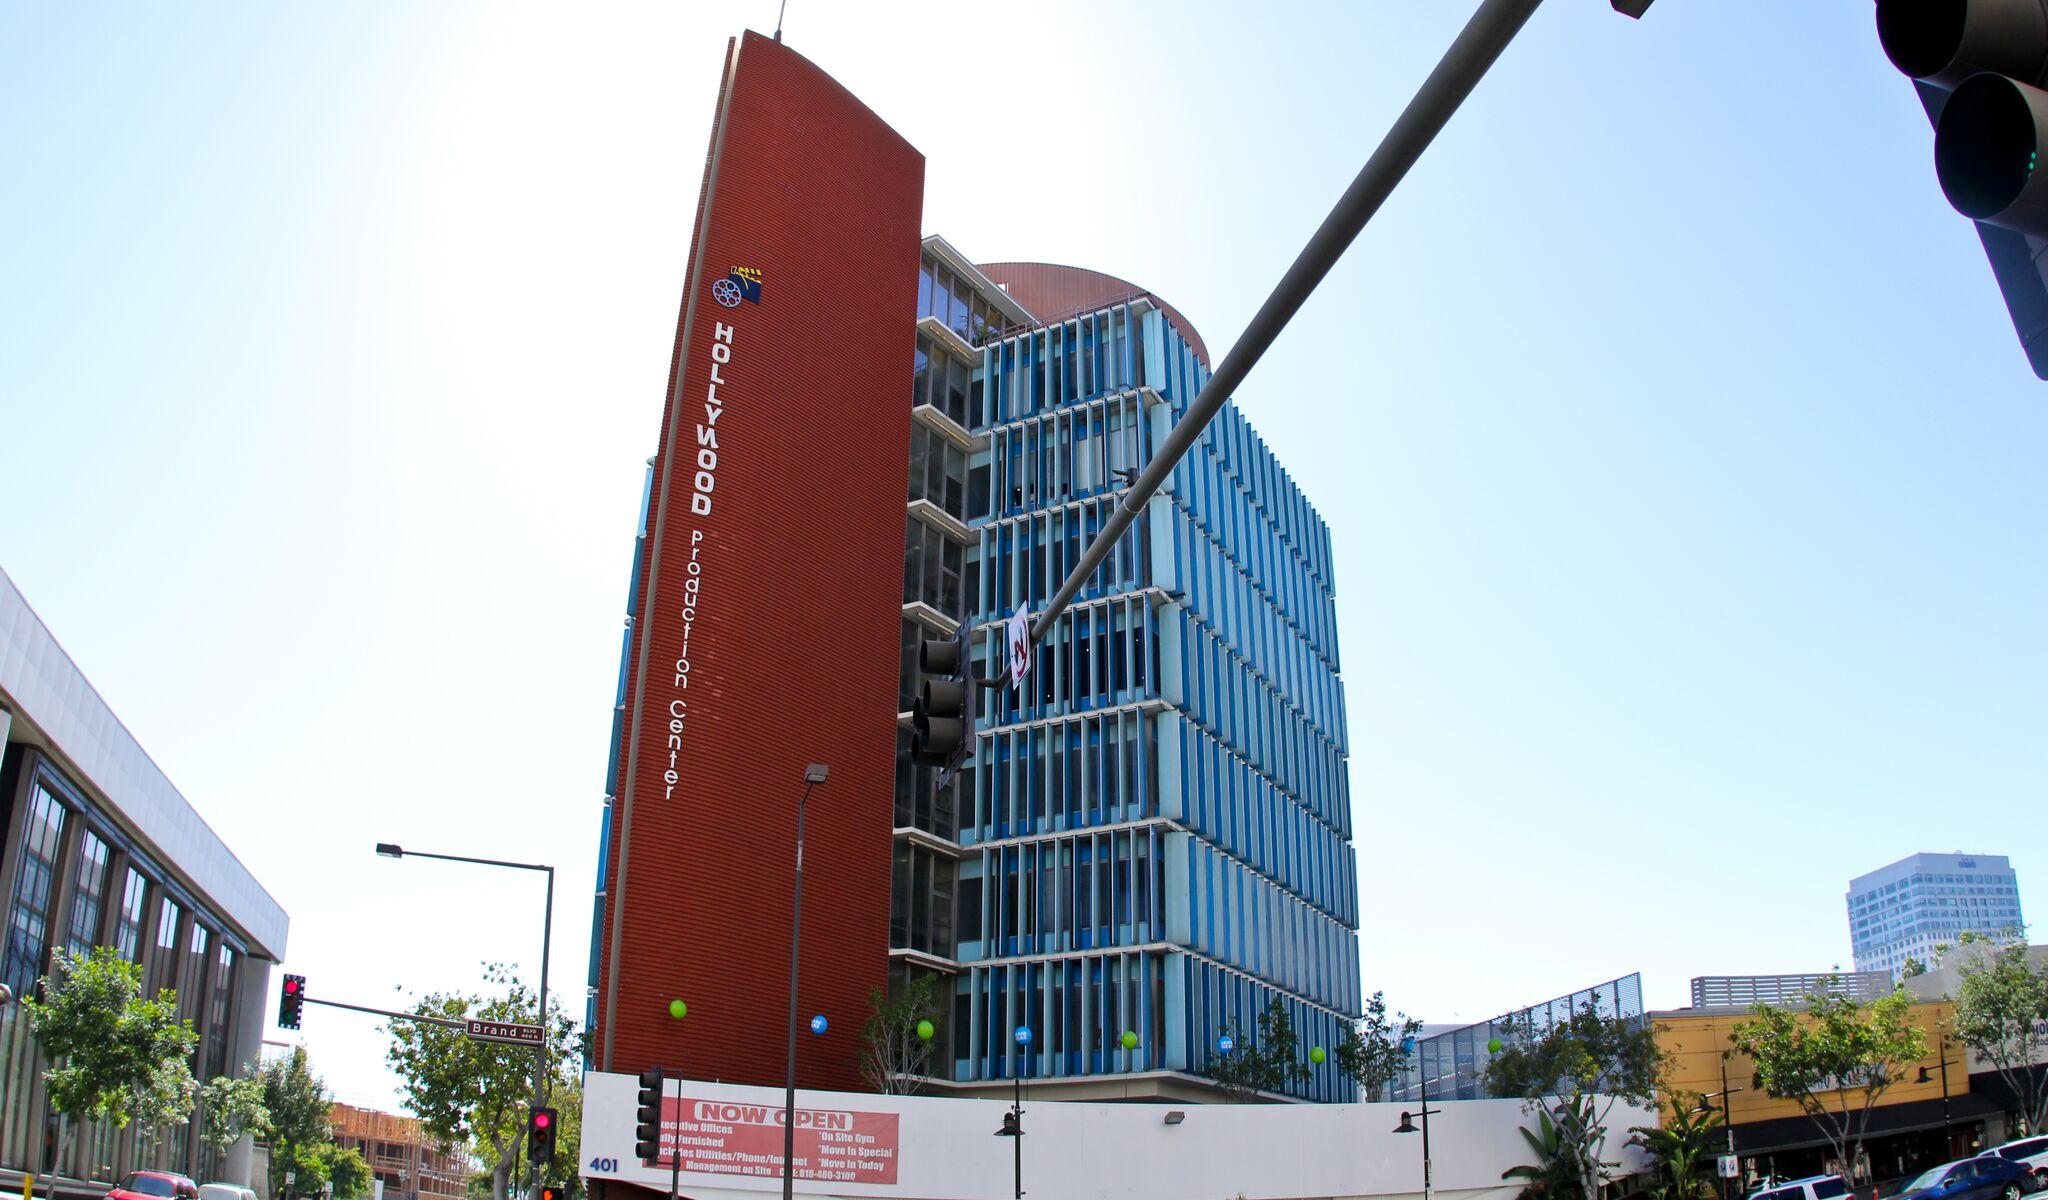 Hollywood Production Center - W. Lexington Dr, Glendale - CA